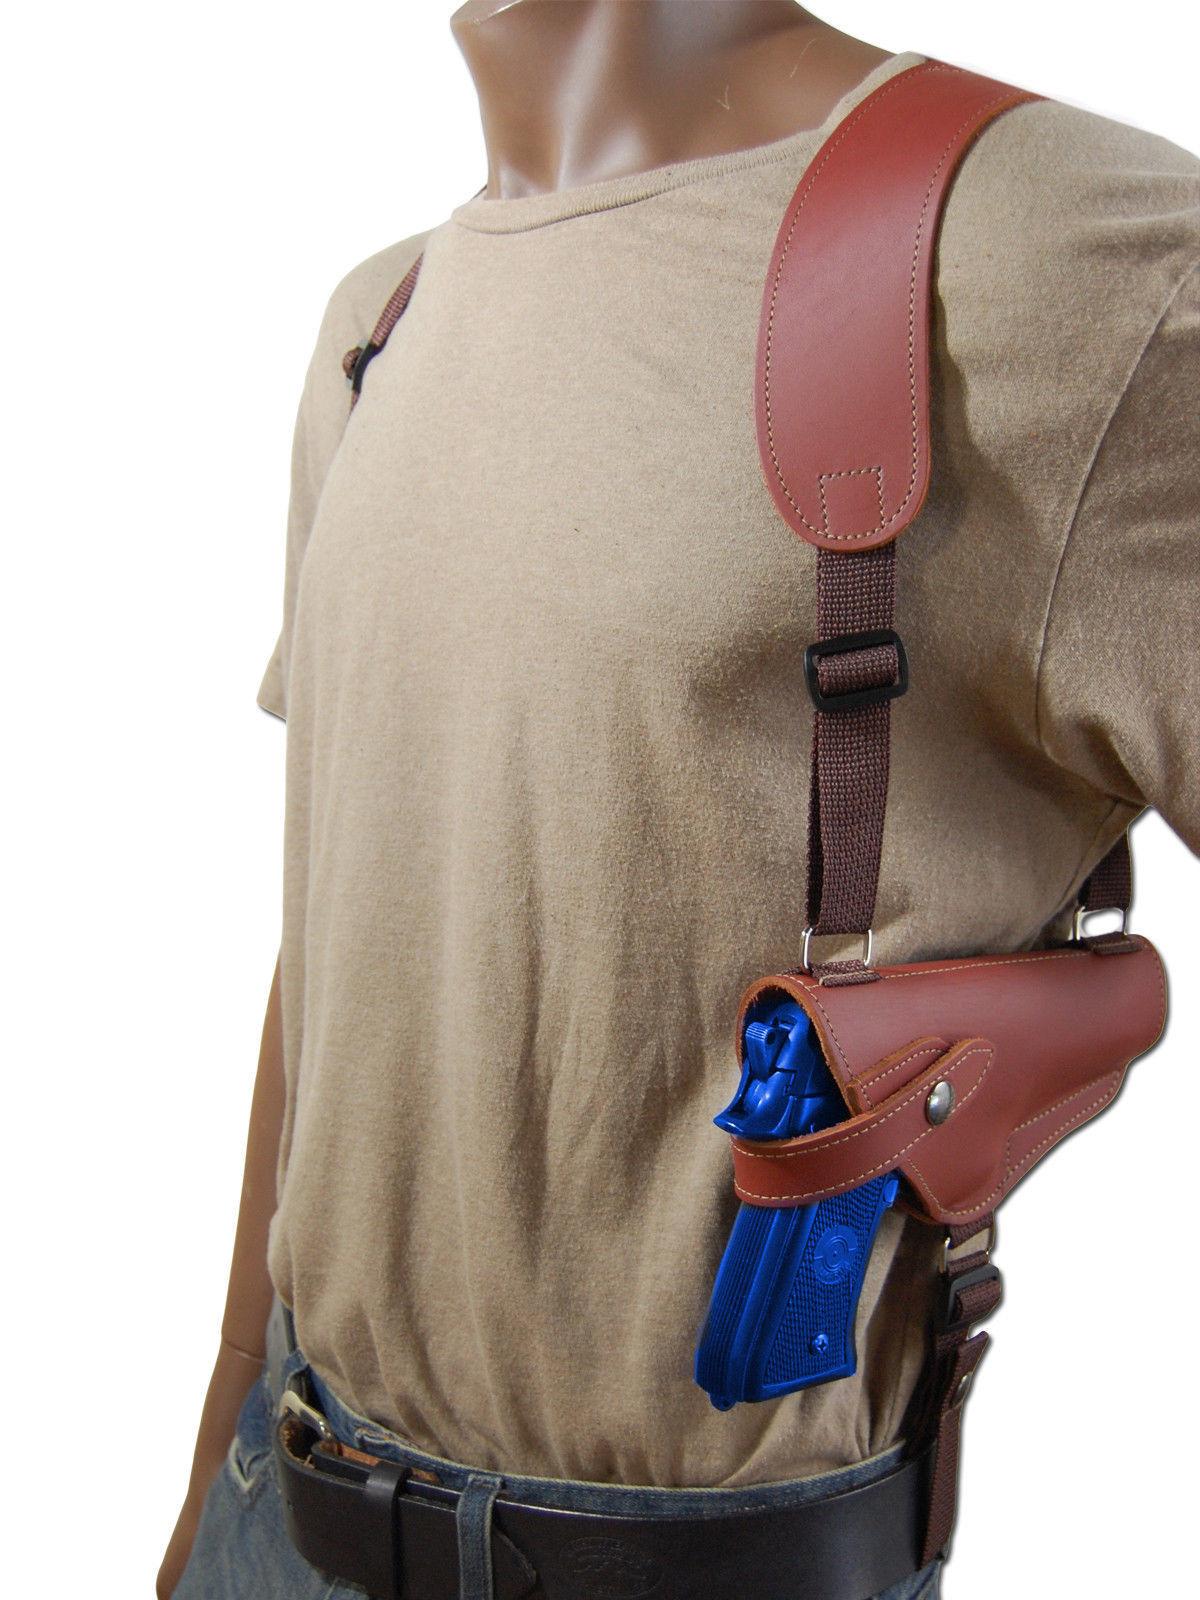 NEW Barsony Horizontal Burgundy Leather Shoulder Holster Smith Wesson Full Size